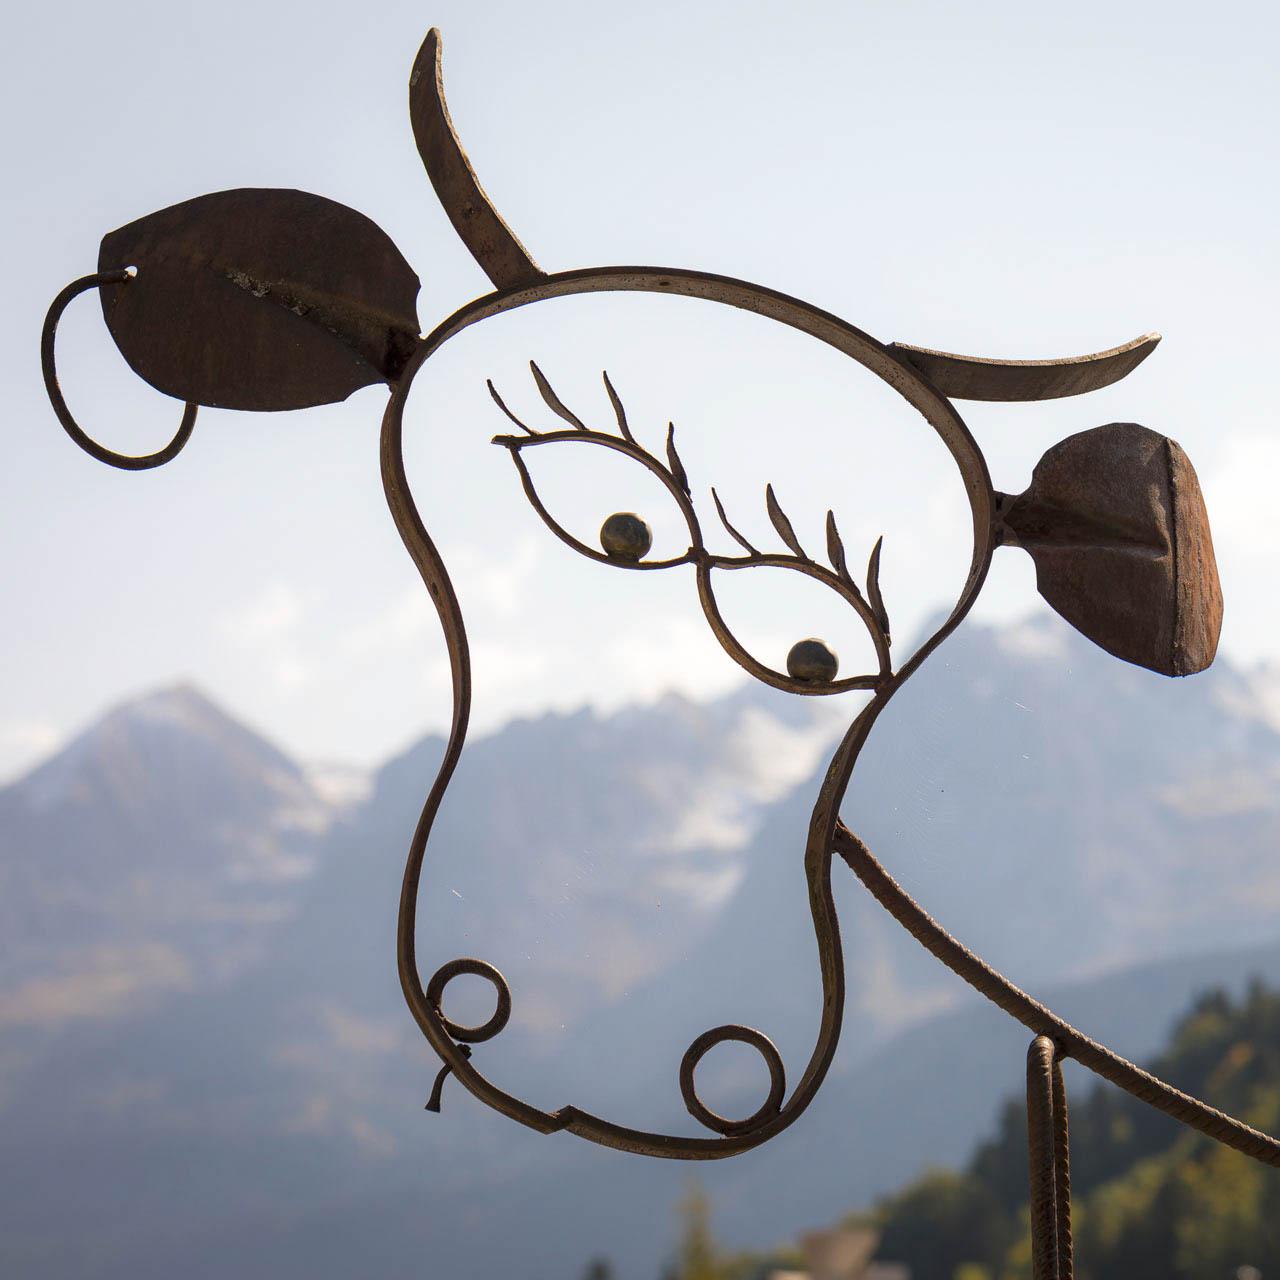 L'art vache au Grand-Bornand - © © C. Cattin - Alpcat Médias